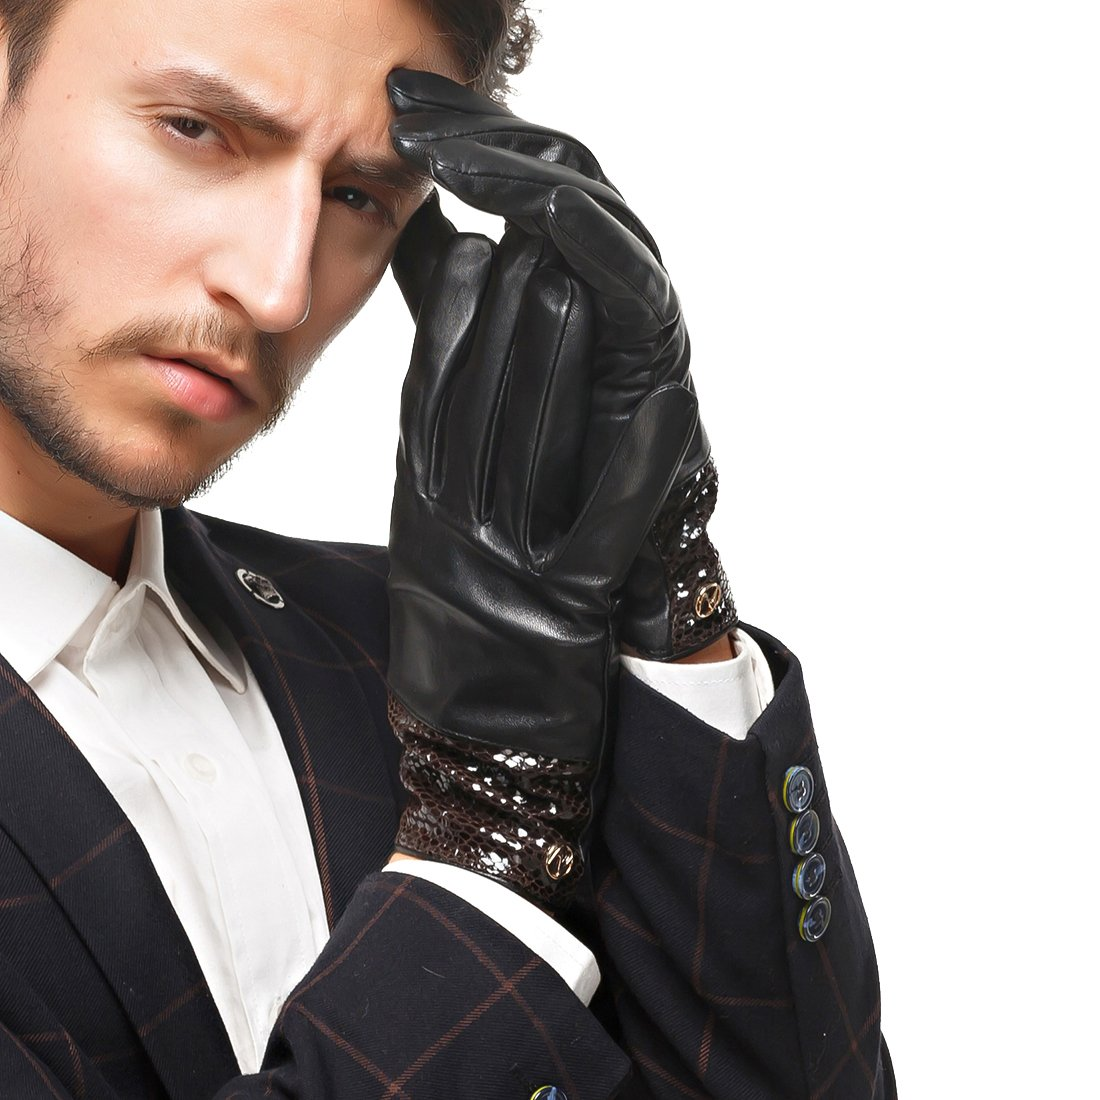 Nappaglo Men's Genuine Lambskin Leather Gloves Nappa Leather Touchscreen Autumn Winter Business Mittens (XXL (Palm Girth:9.5''-10''), Black (Touchscreen))